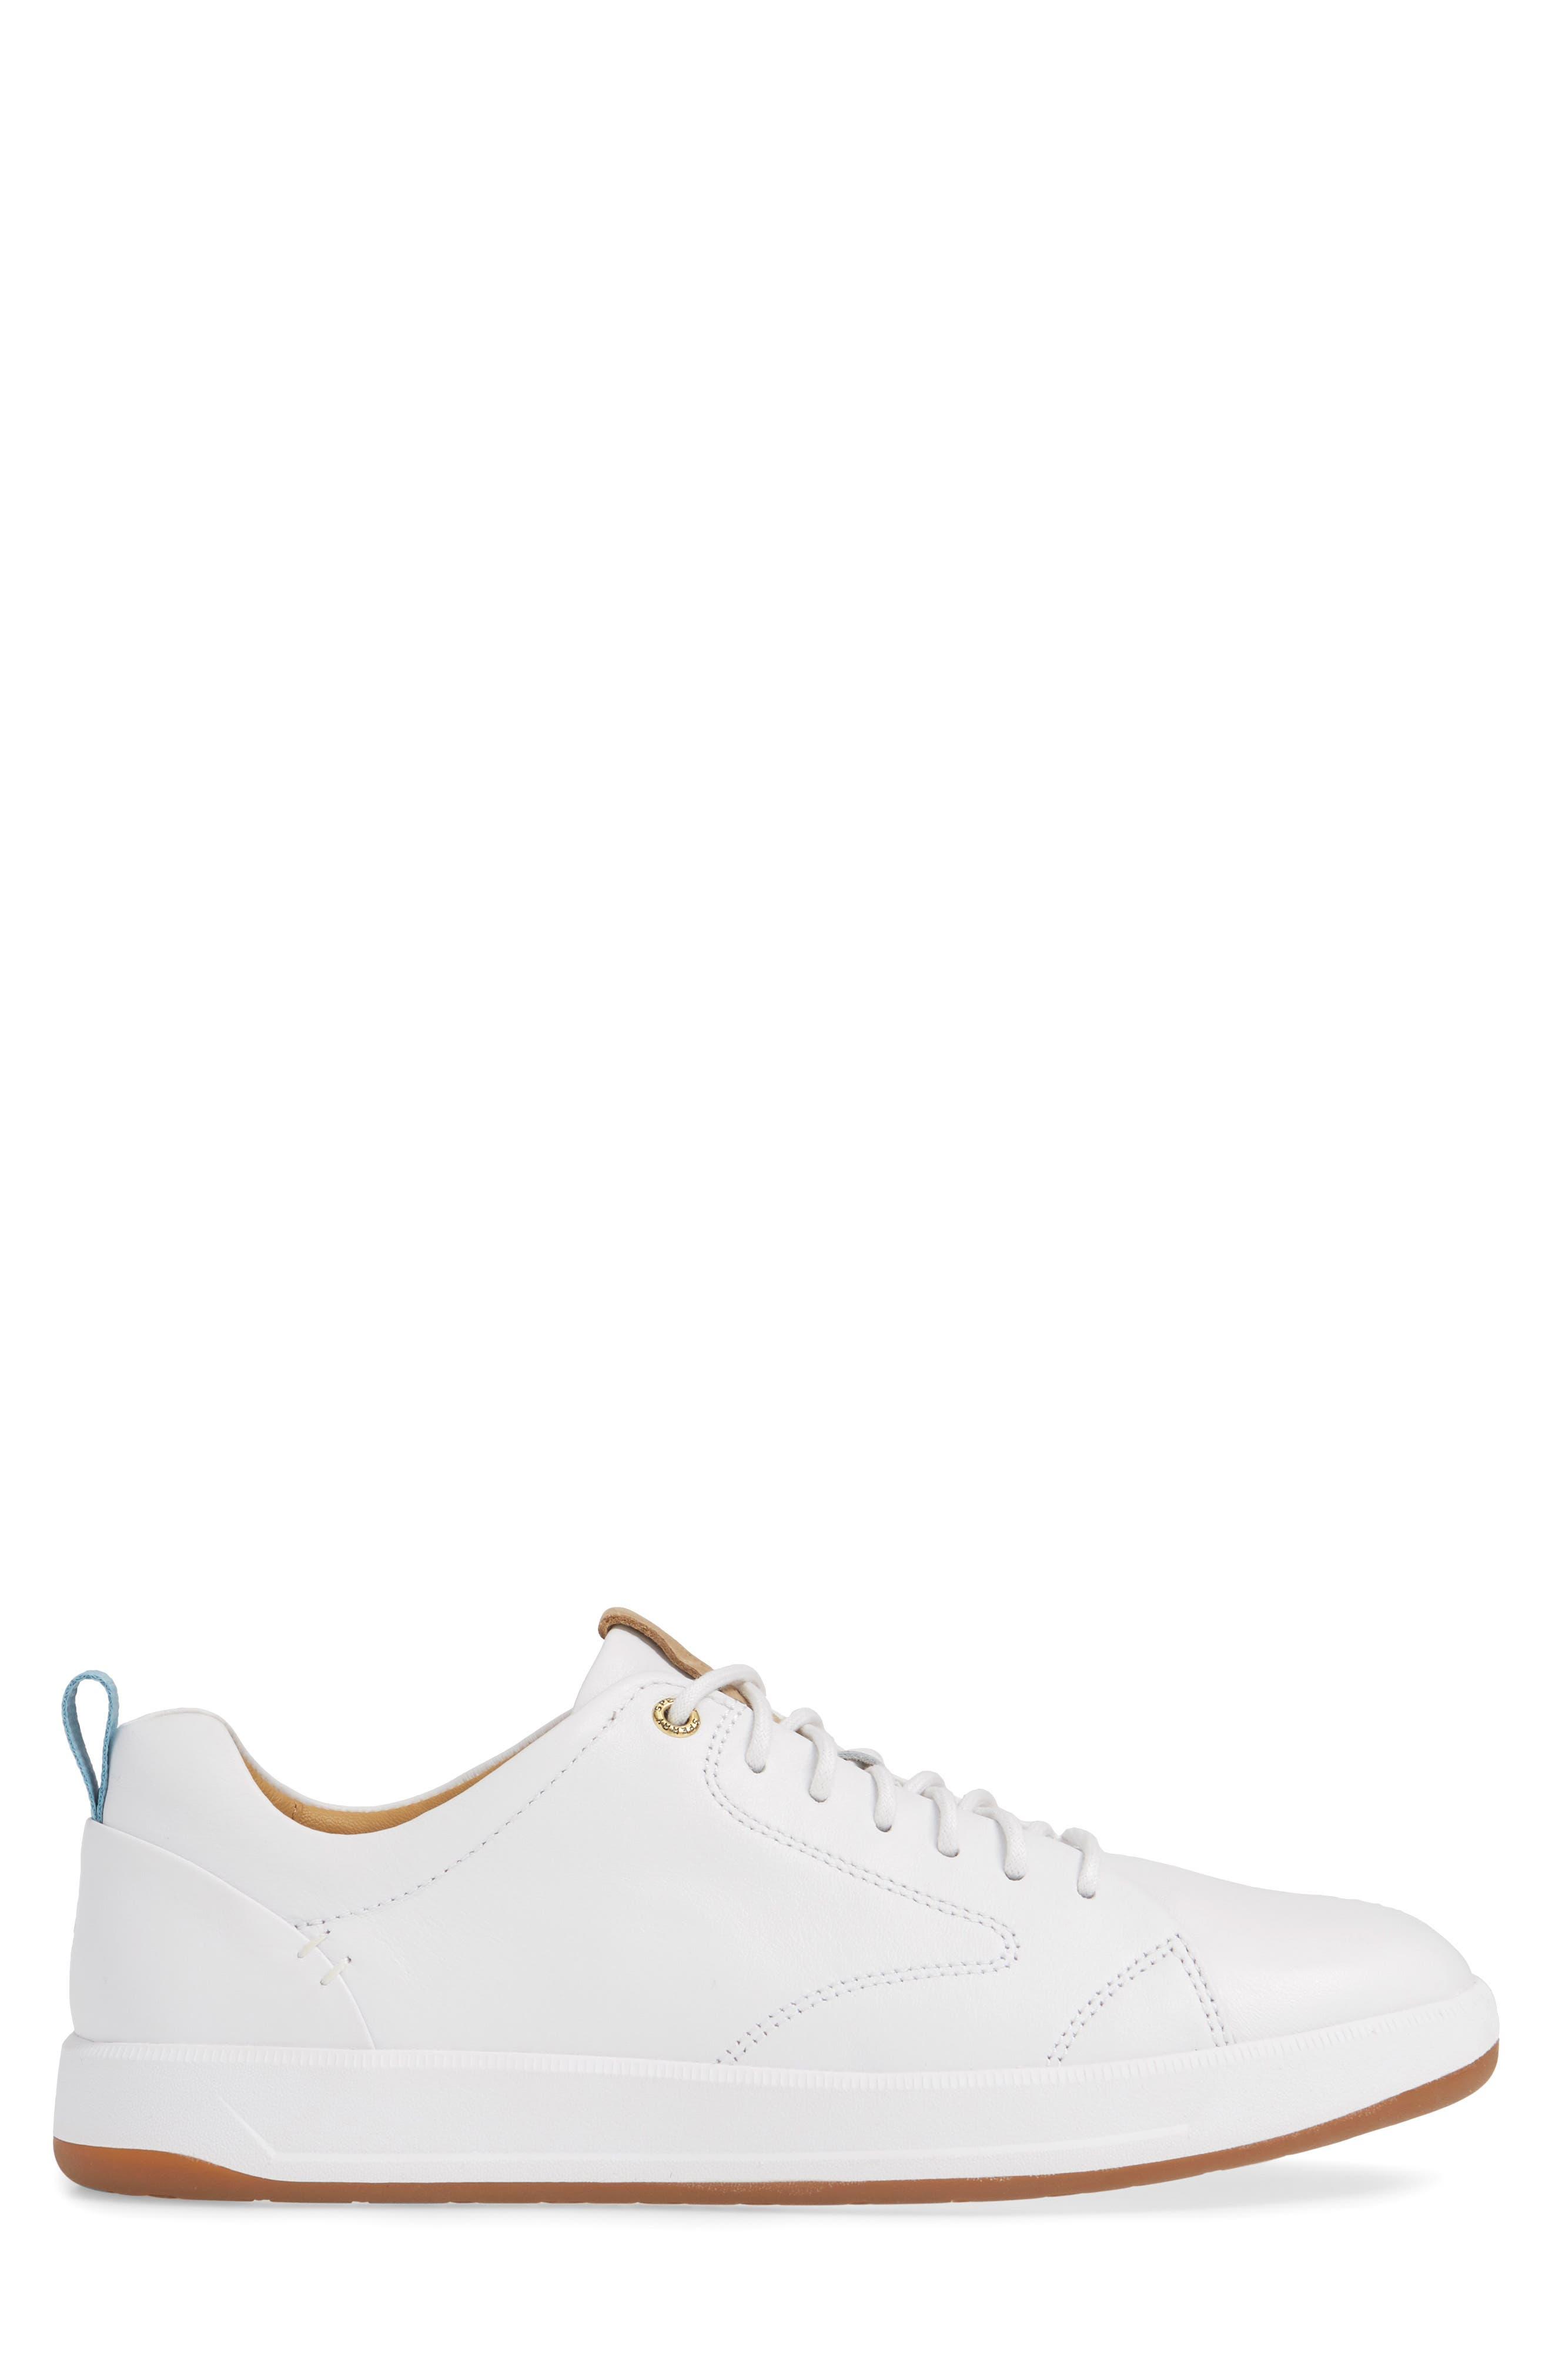 SPERRY, Gold Cup Richfield LTT Sneaker, Alternate thumbnail 3, color, WHITE